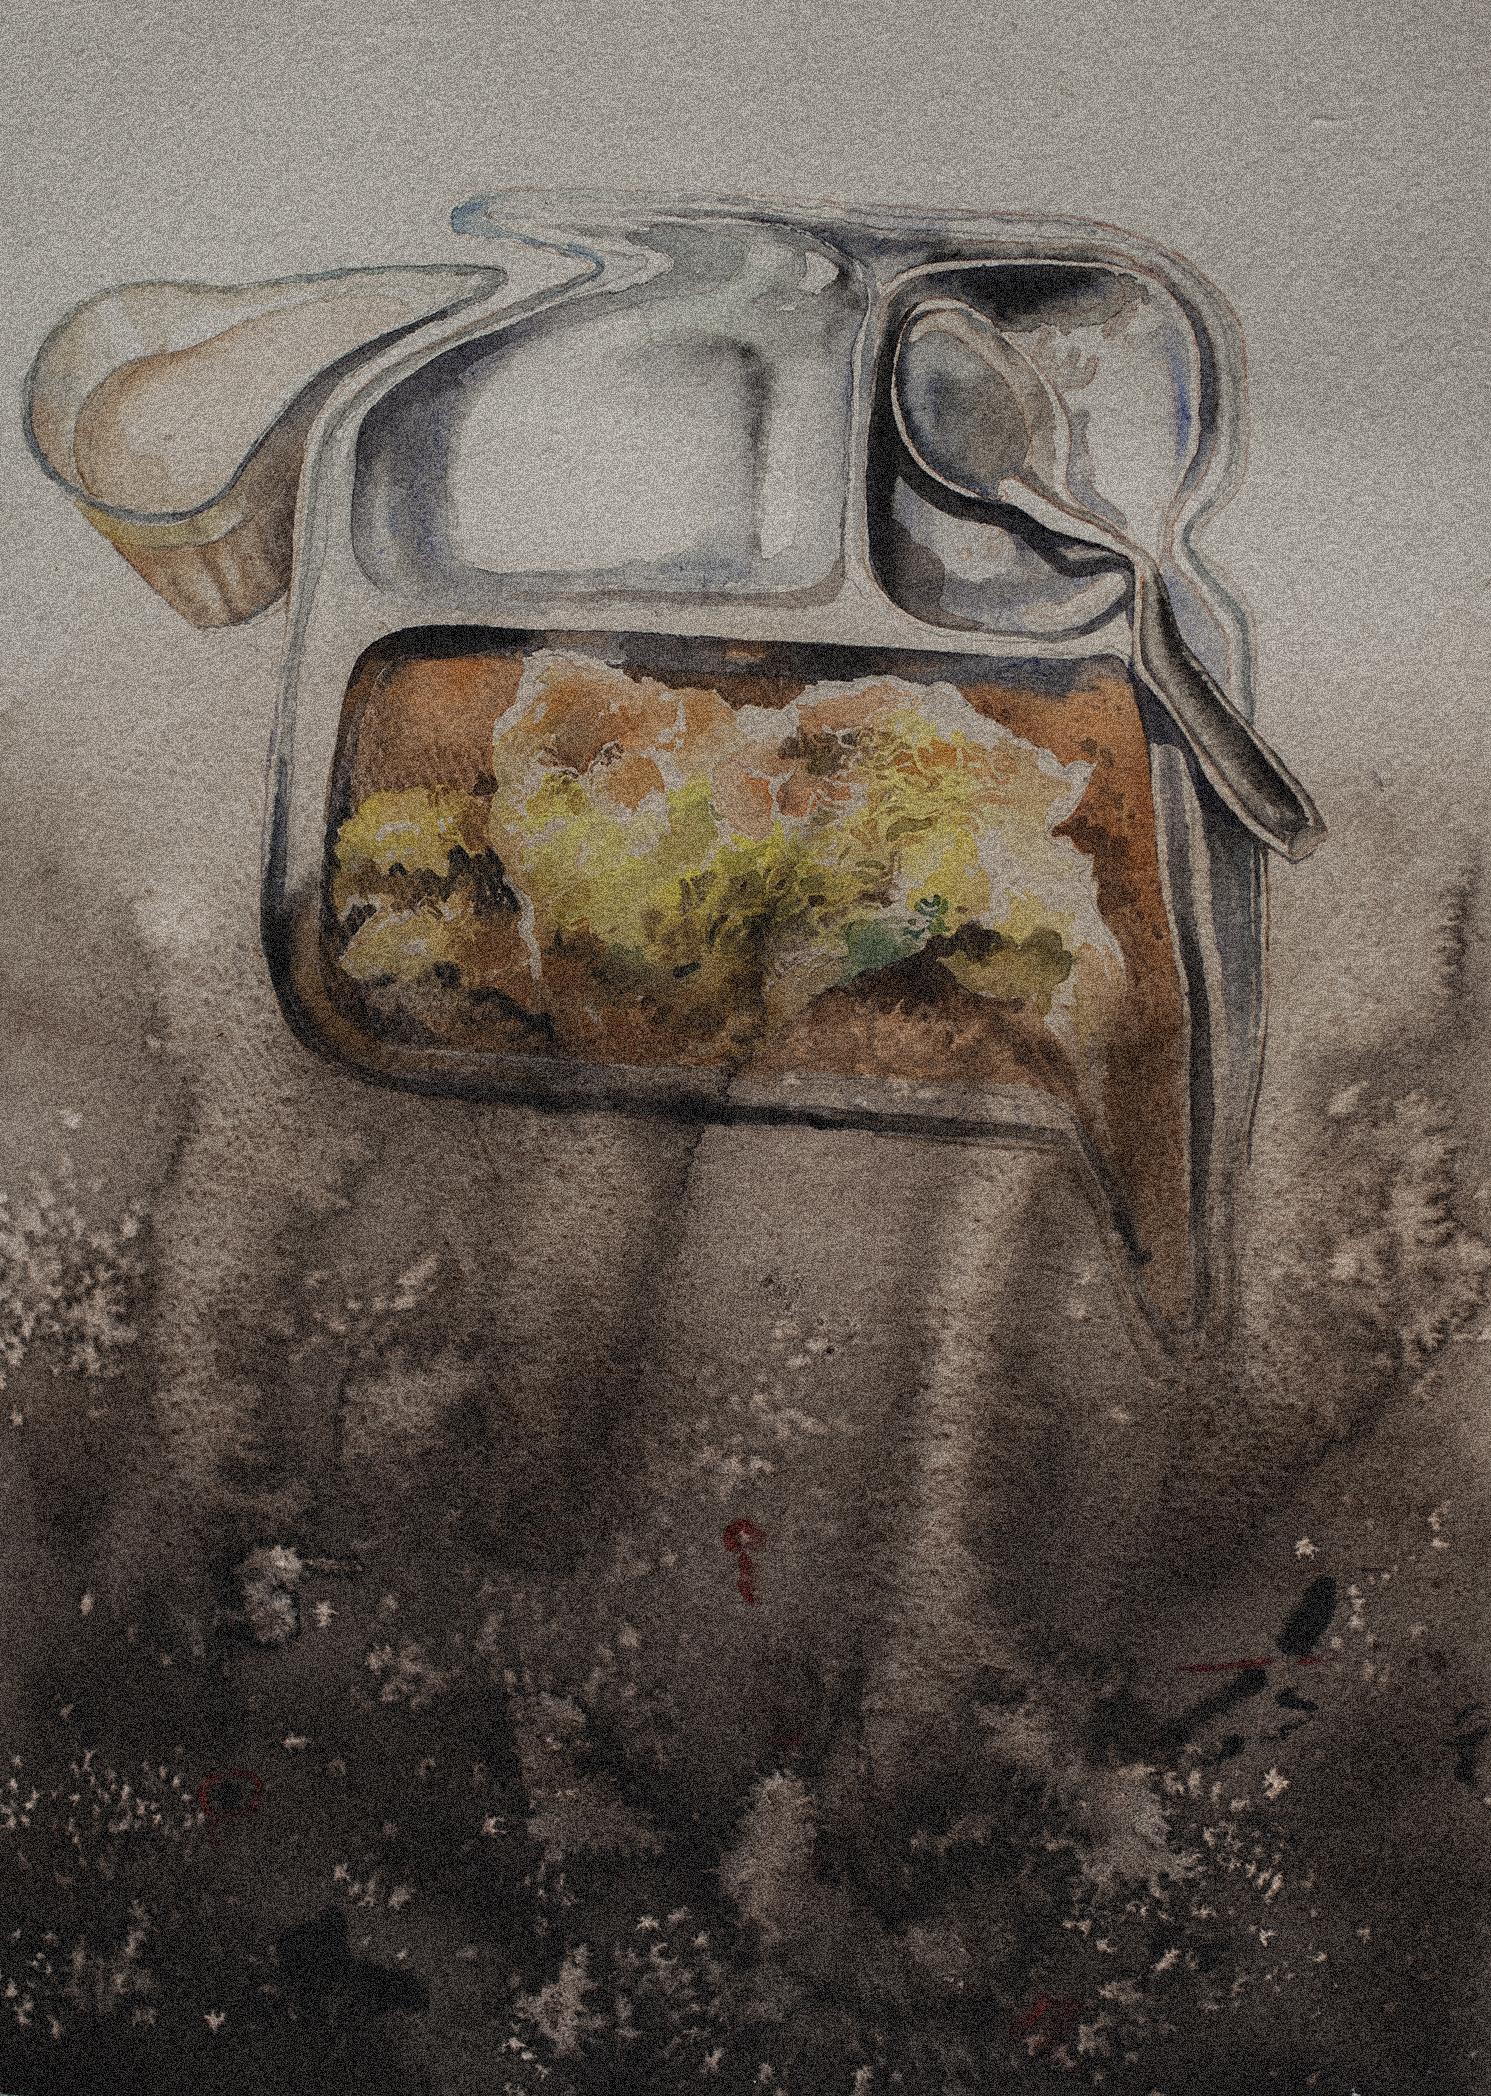 CANTEEN FOOD PORTRAIT.